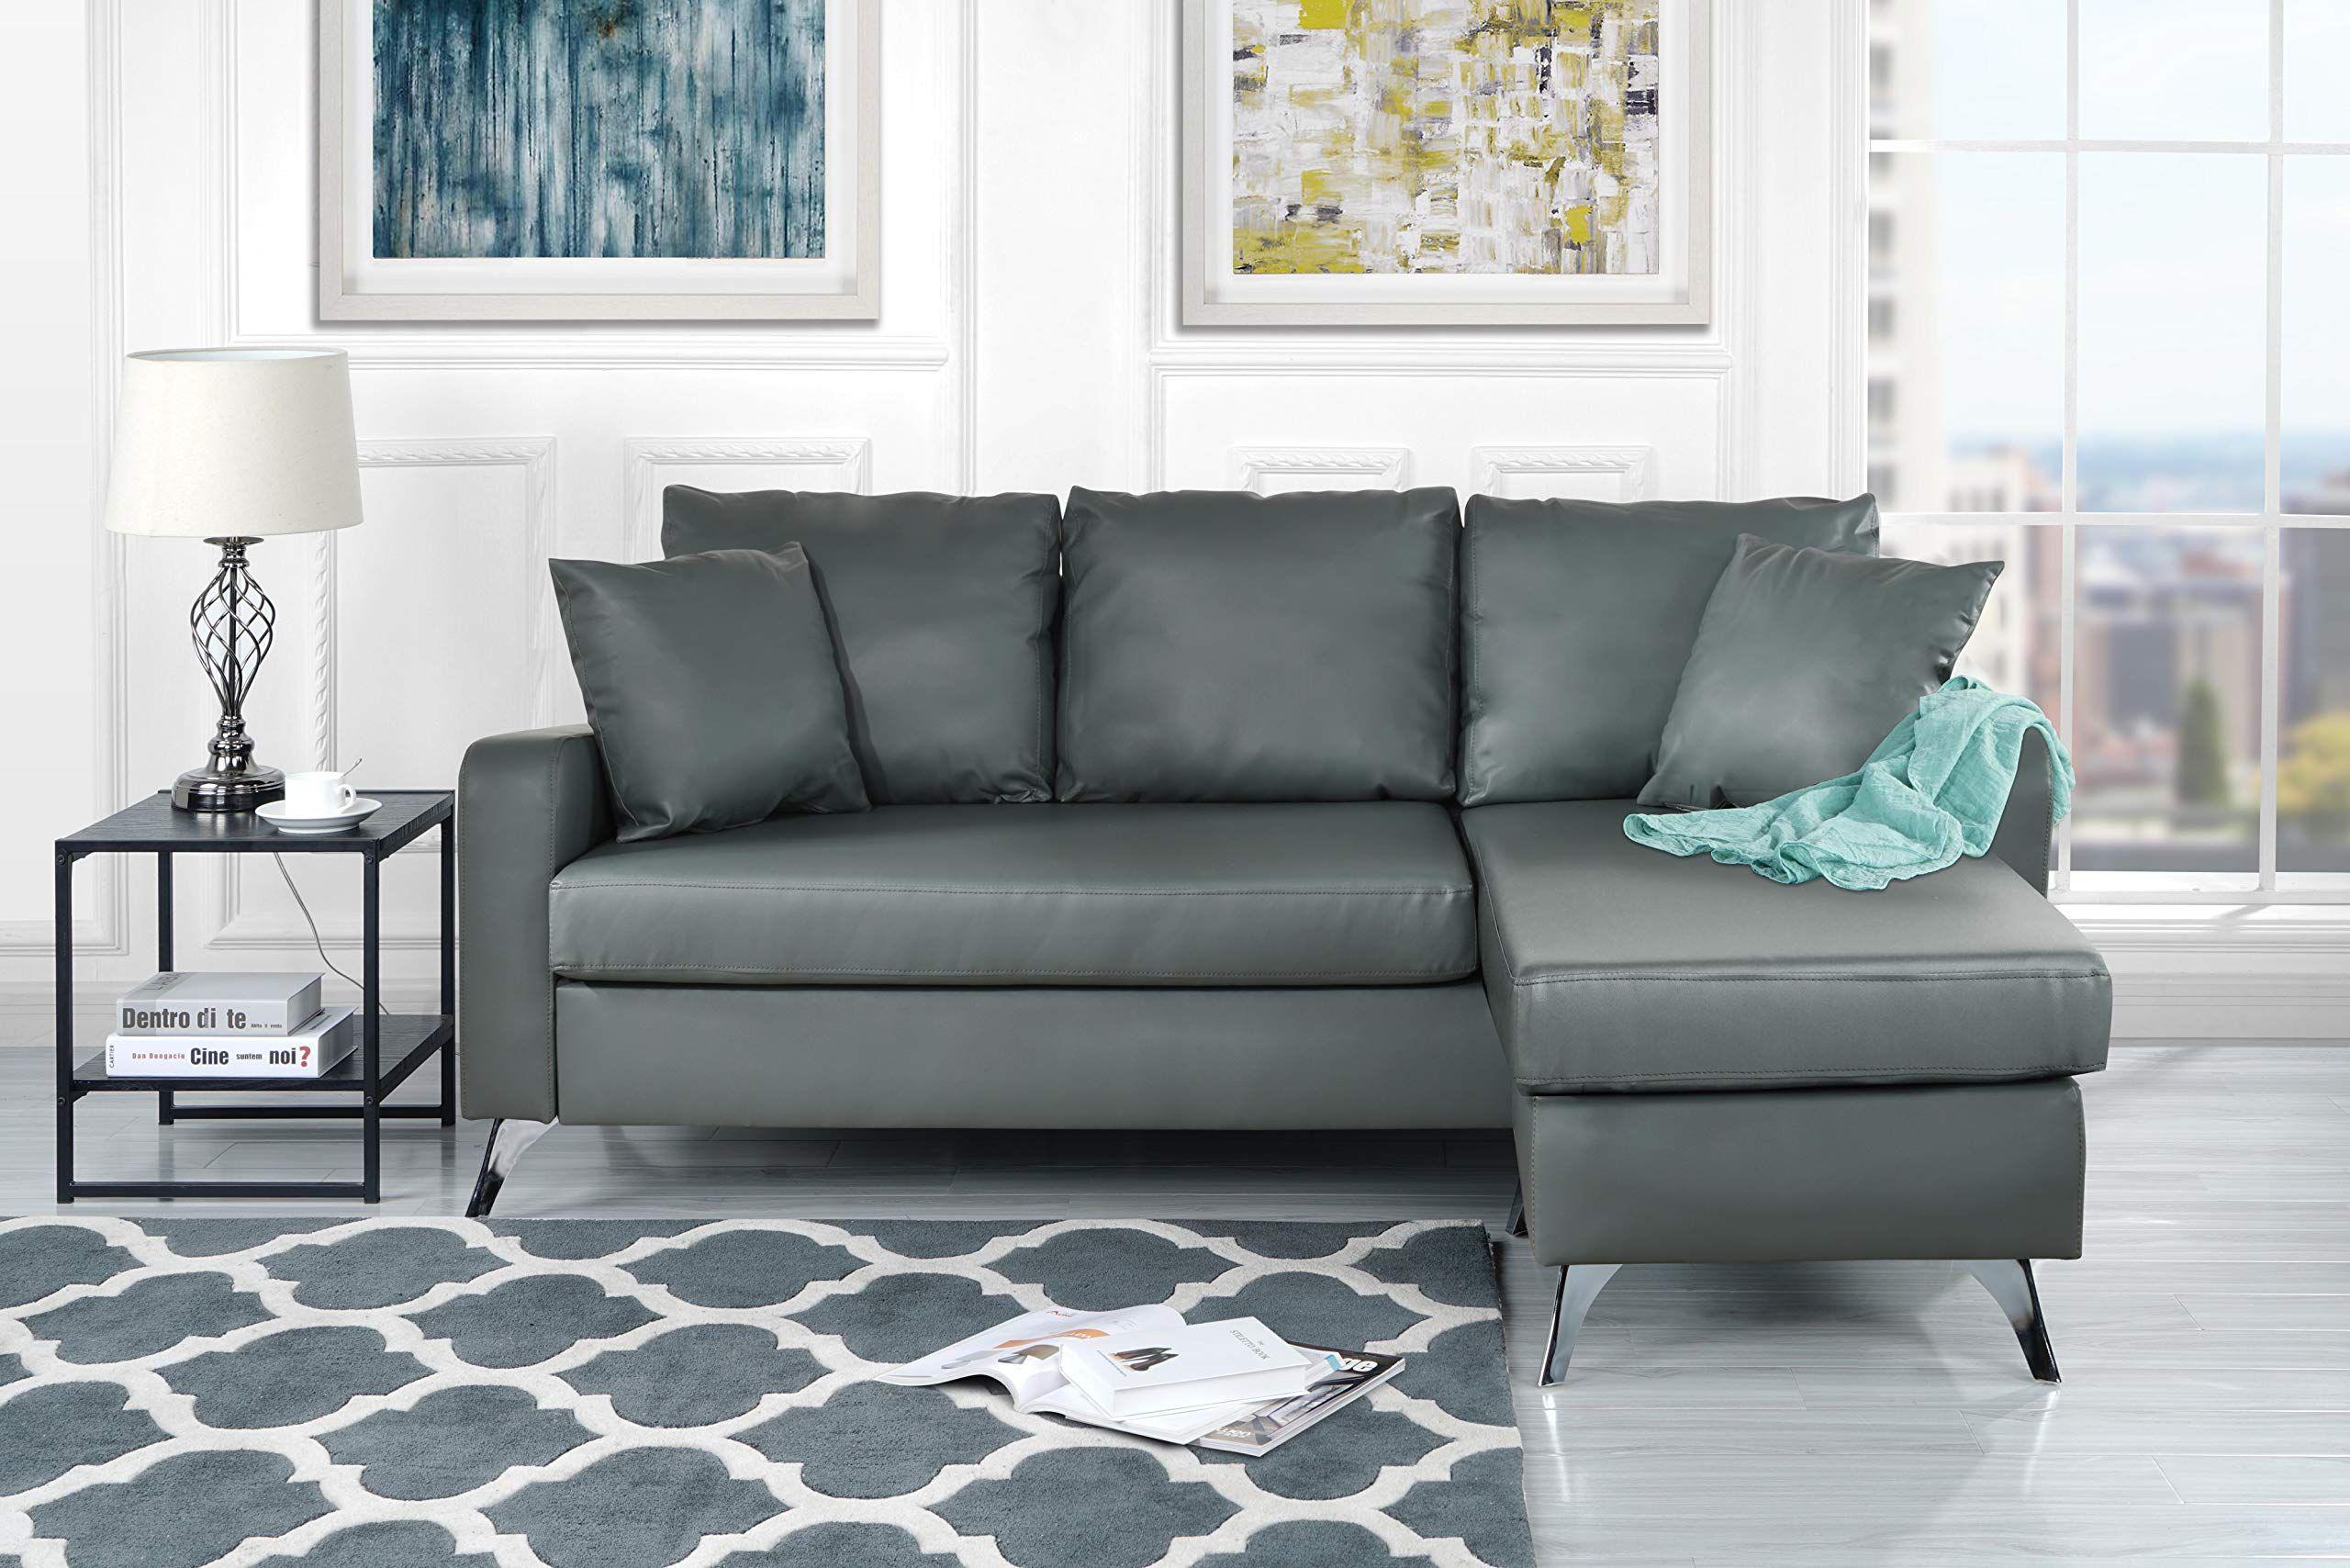 Divano Roma Furniture Bonded Sectional, Light Grey